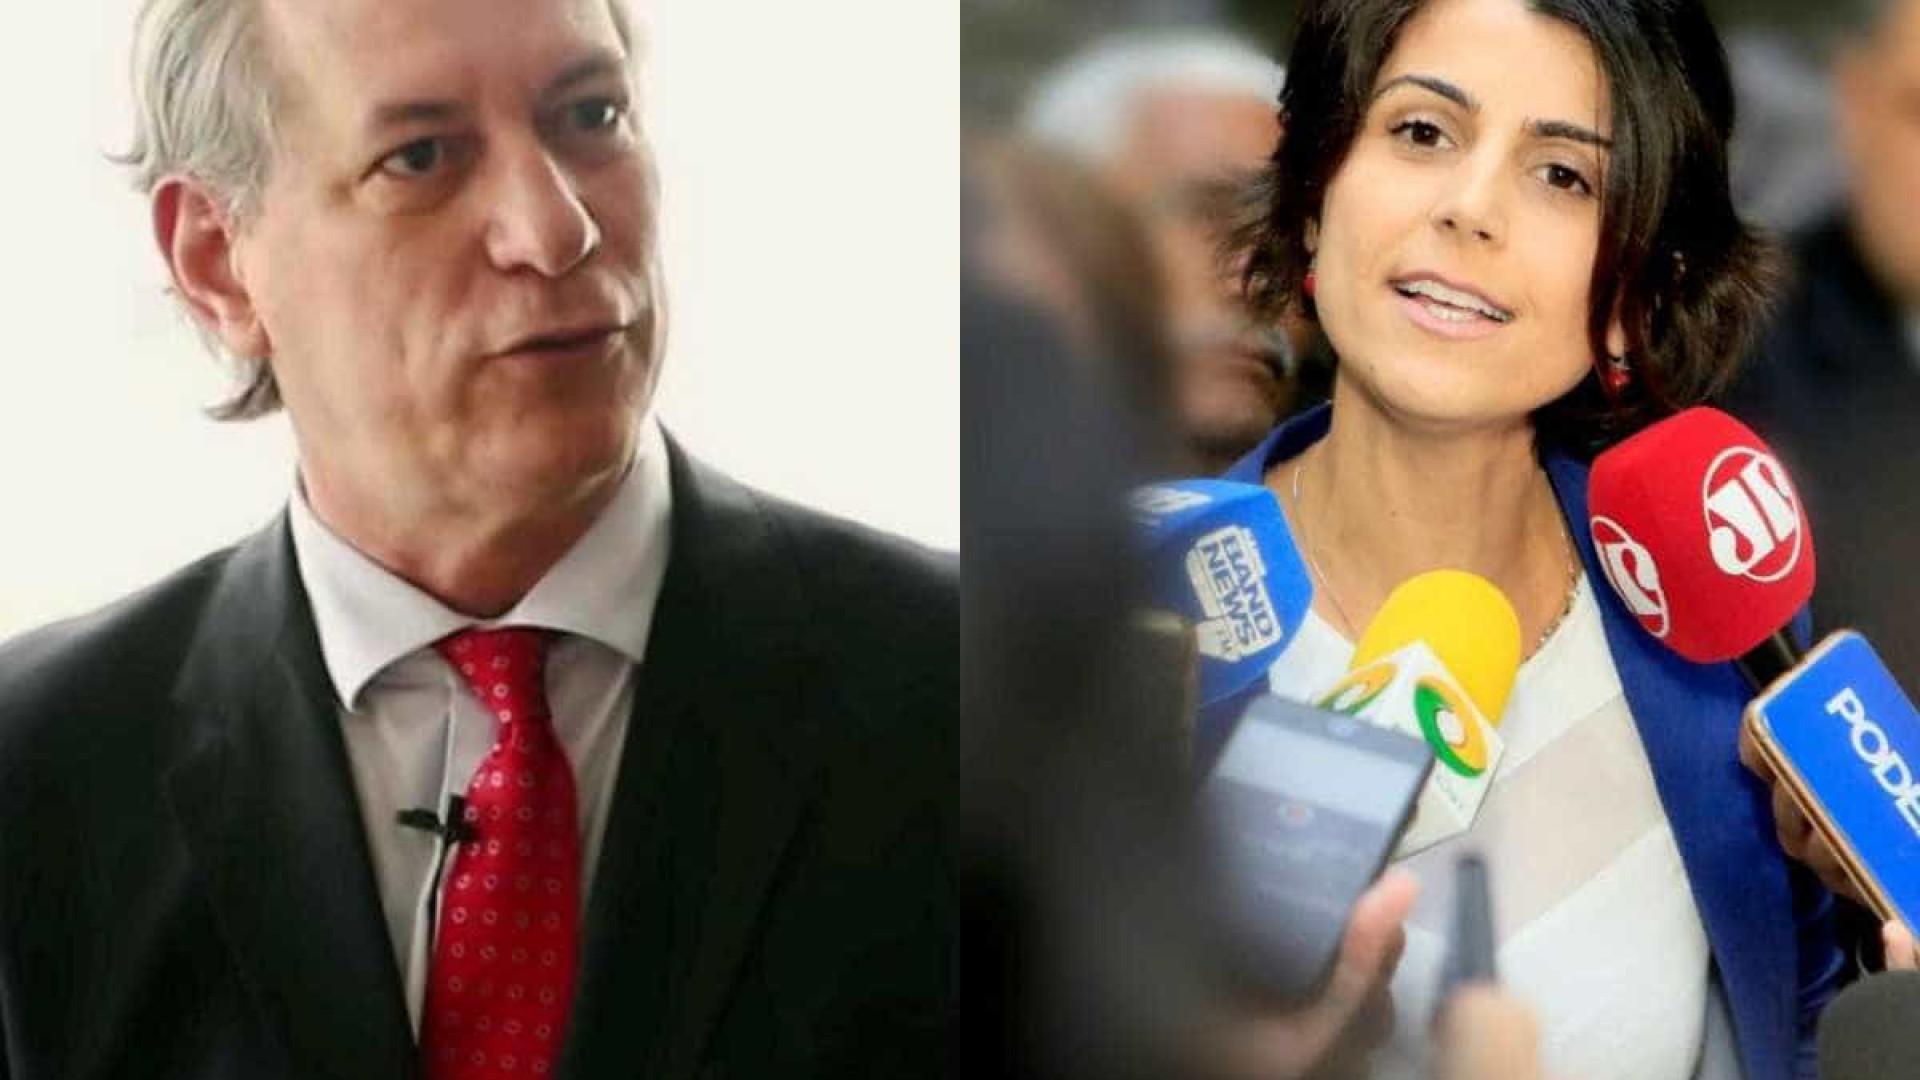 Manuela D'Ávila rebate Ciro sobre rapidez no julgamento de Lula